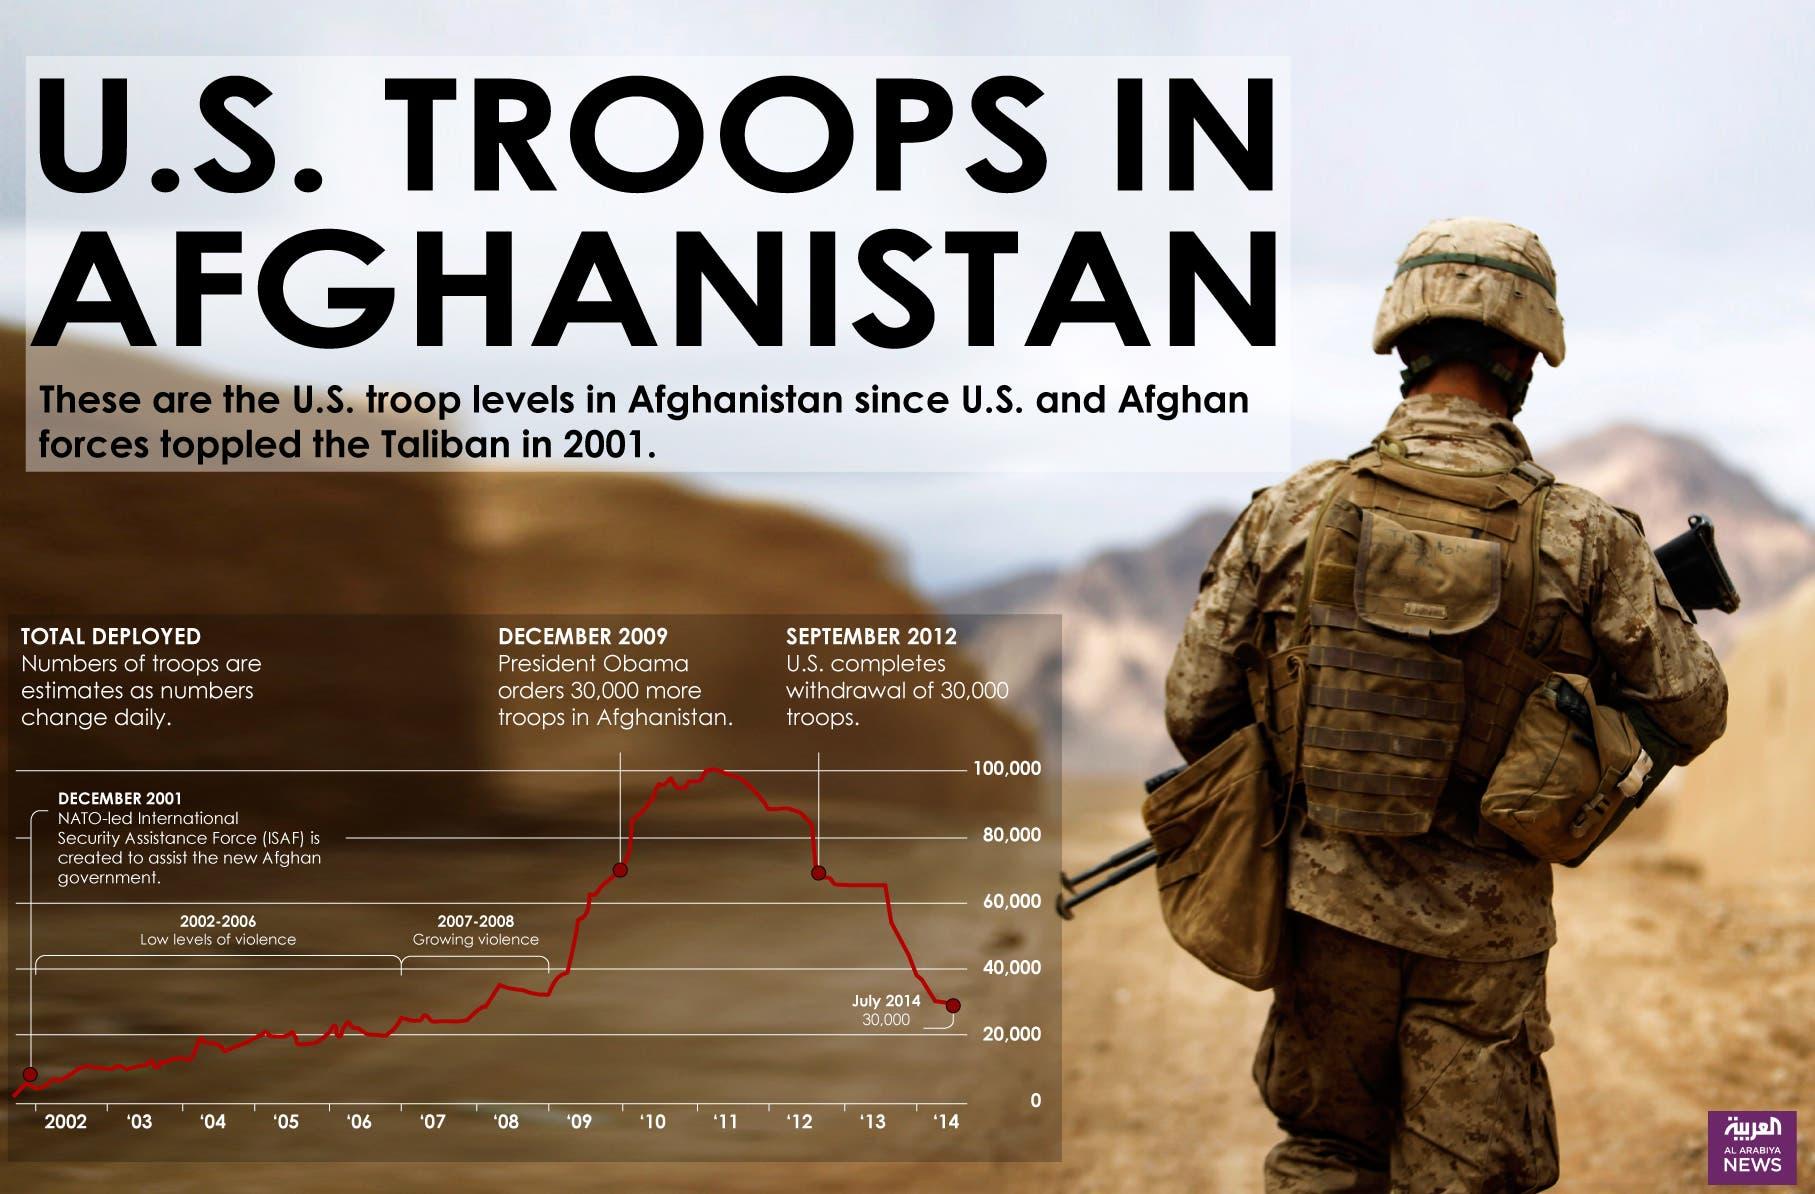 Infographic: U.S. troops in Afghanistan